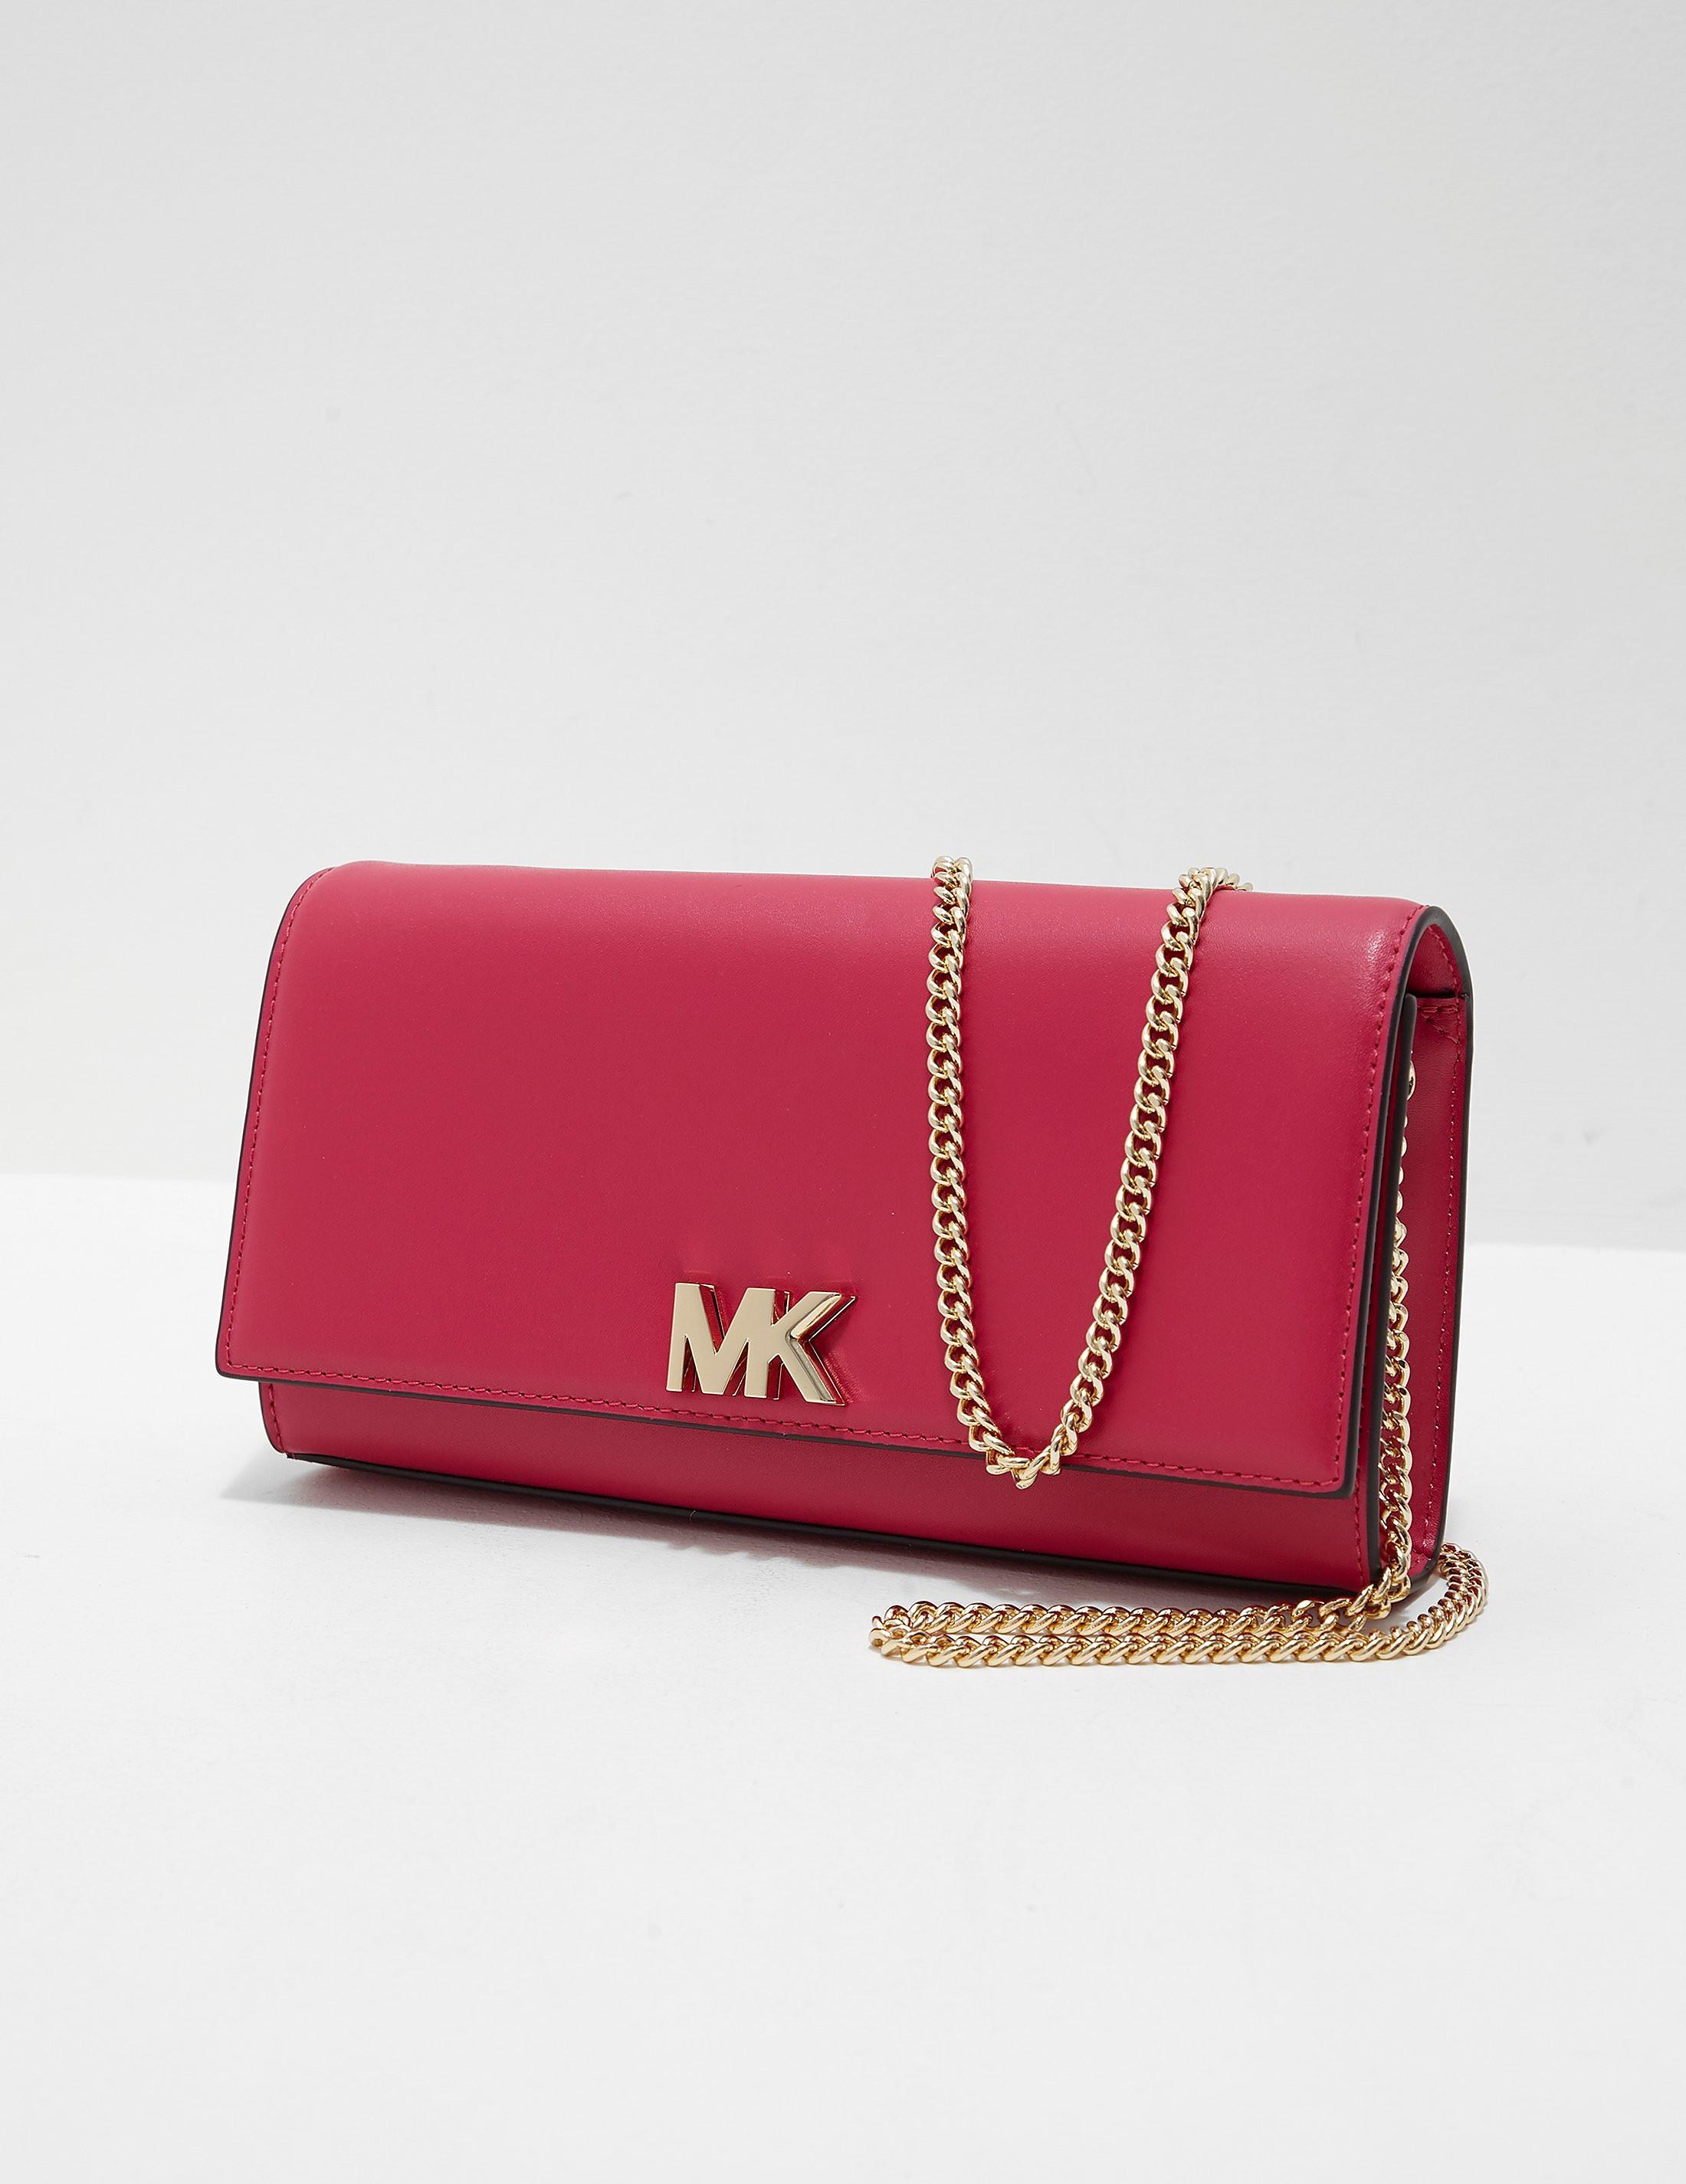 Michael Kors East West Clutch Bag